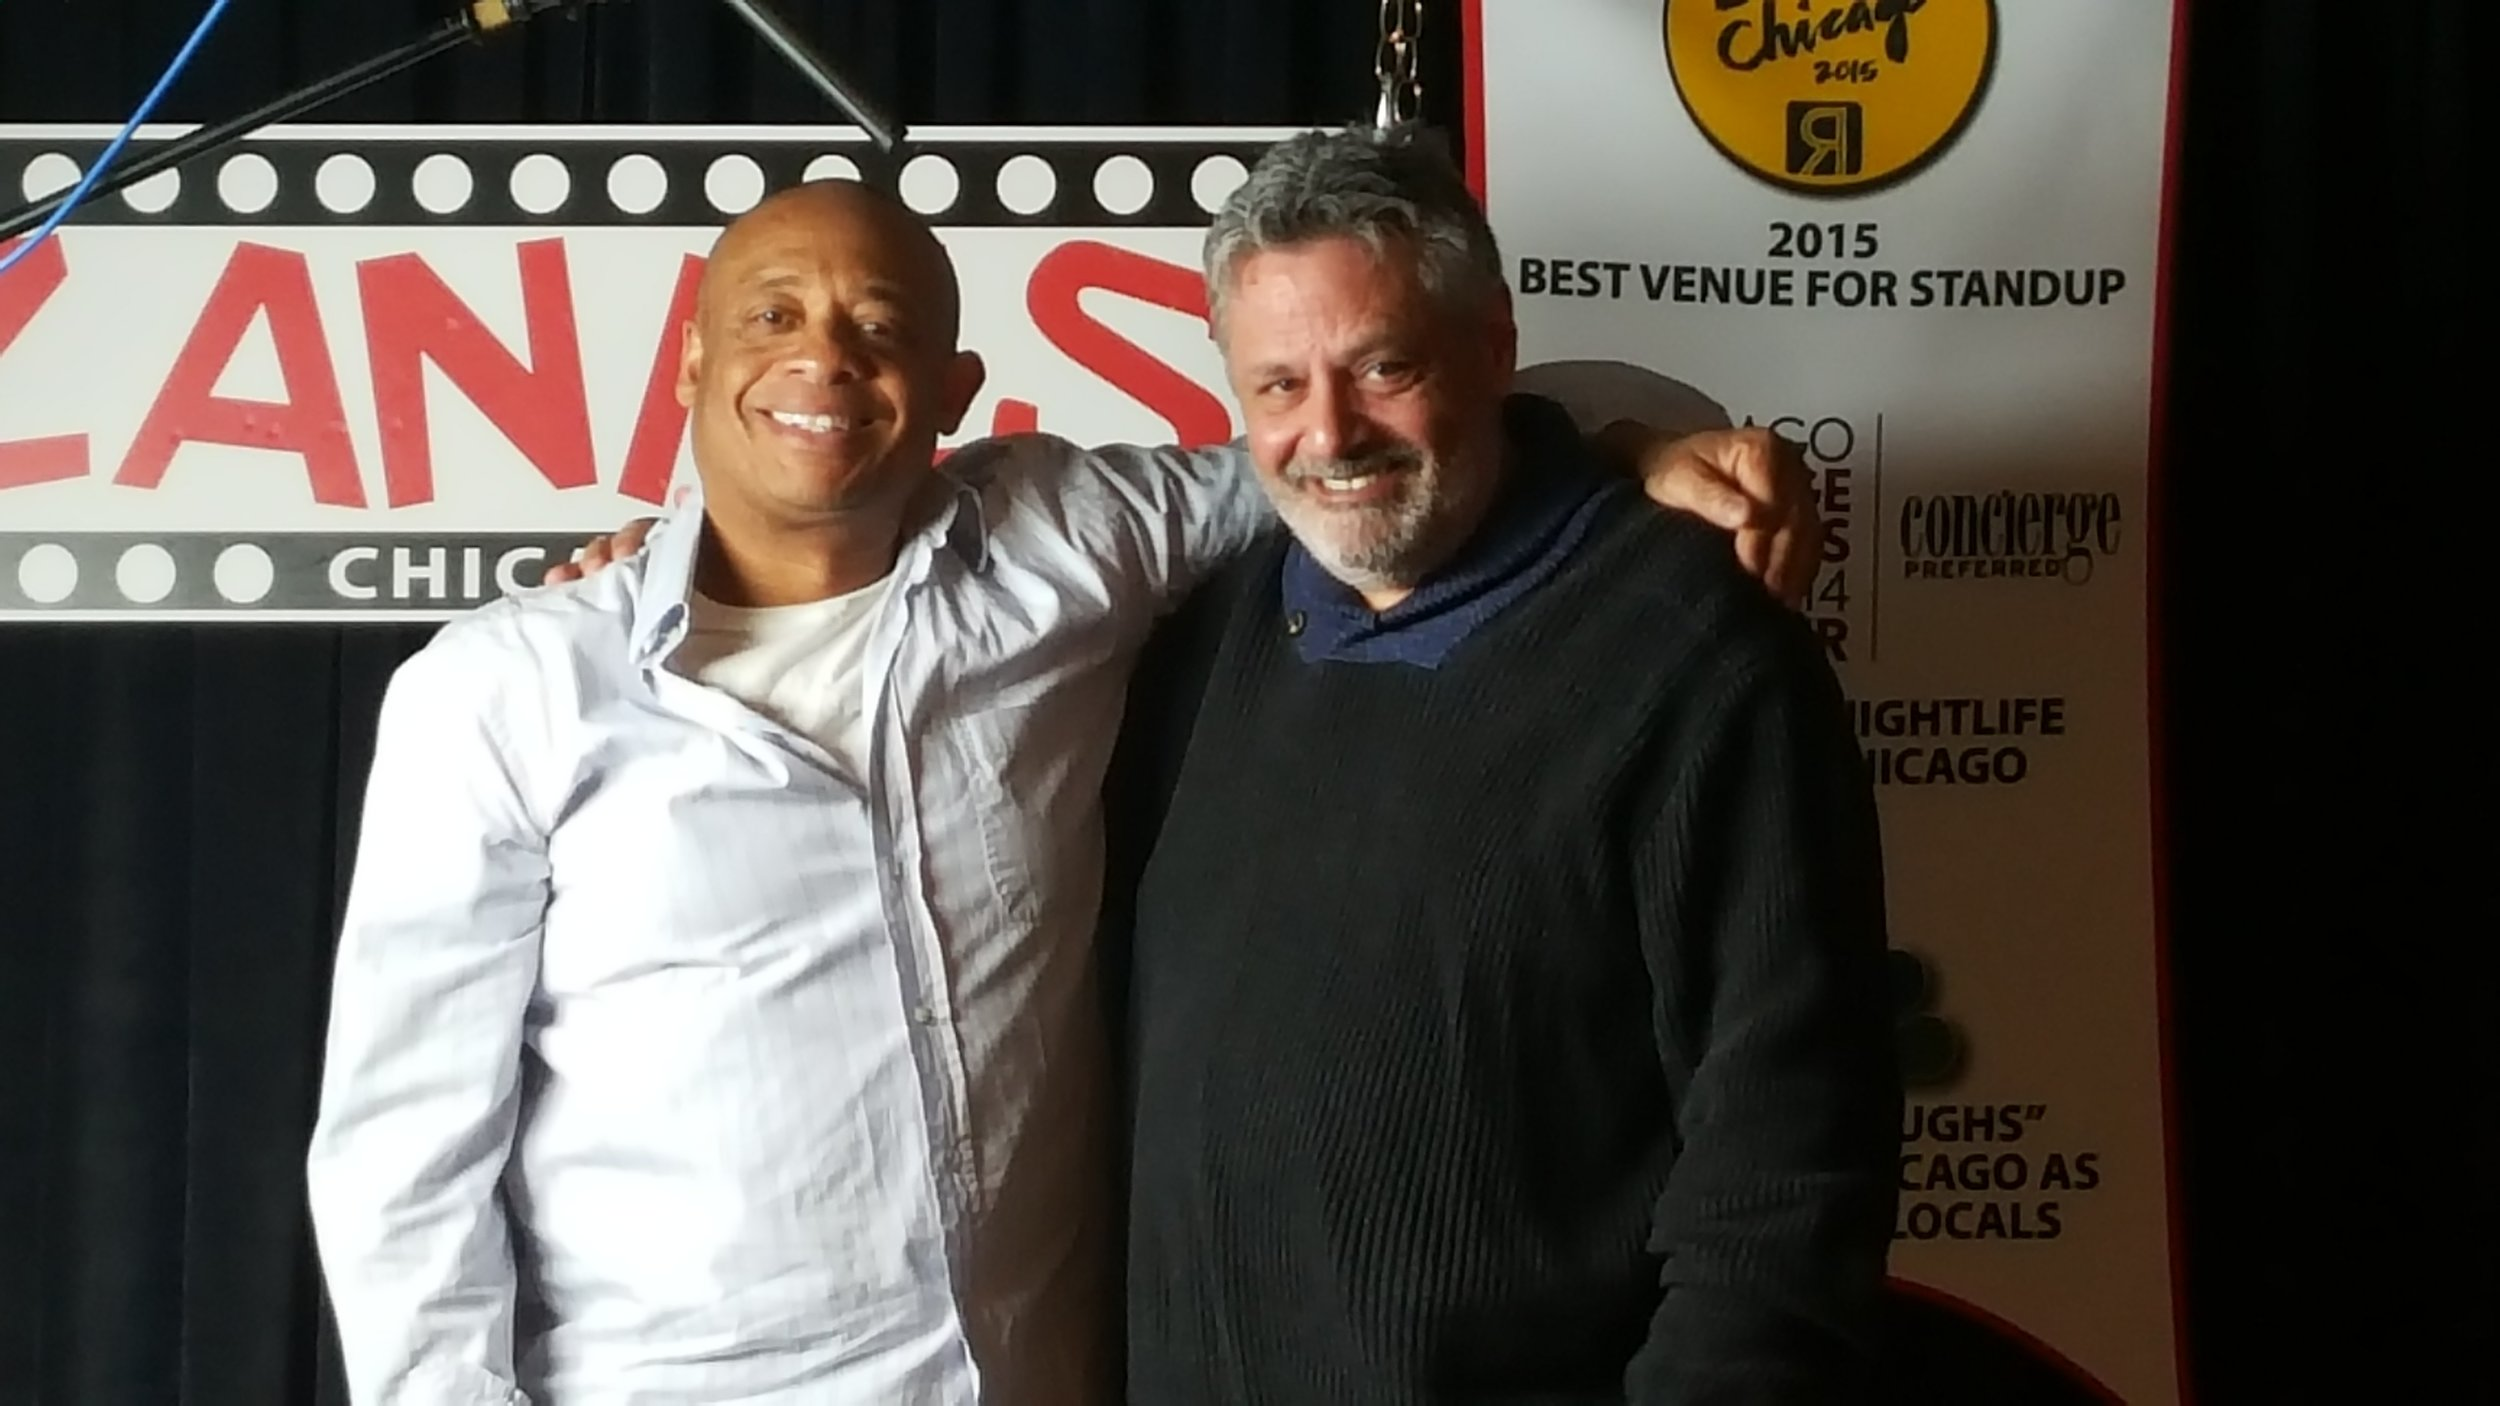 Michael Alexander with Bill Gorgo